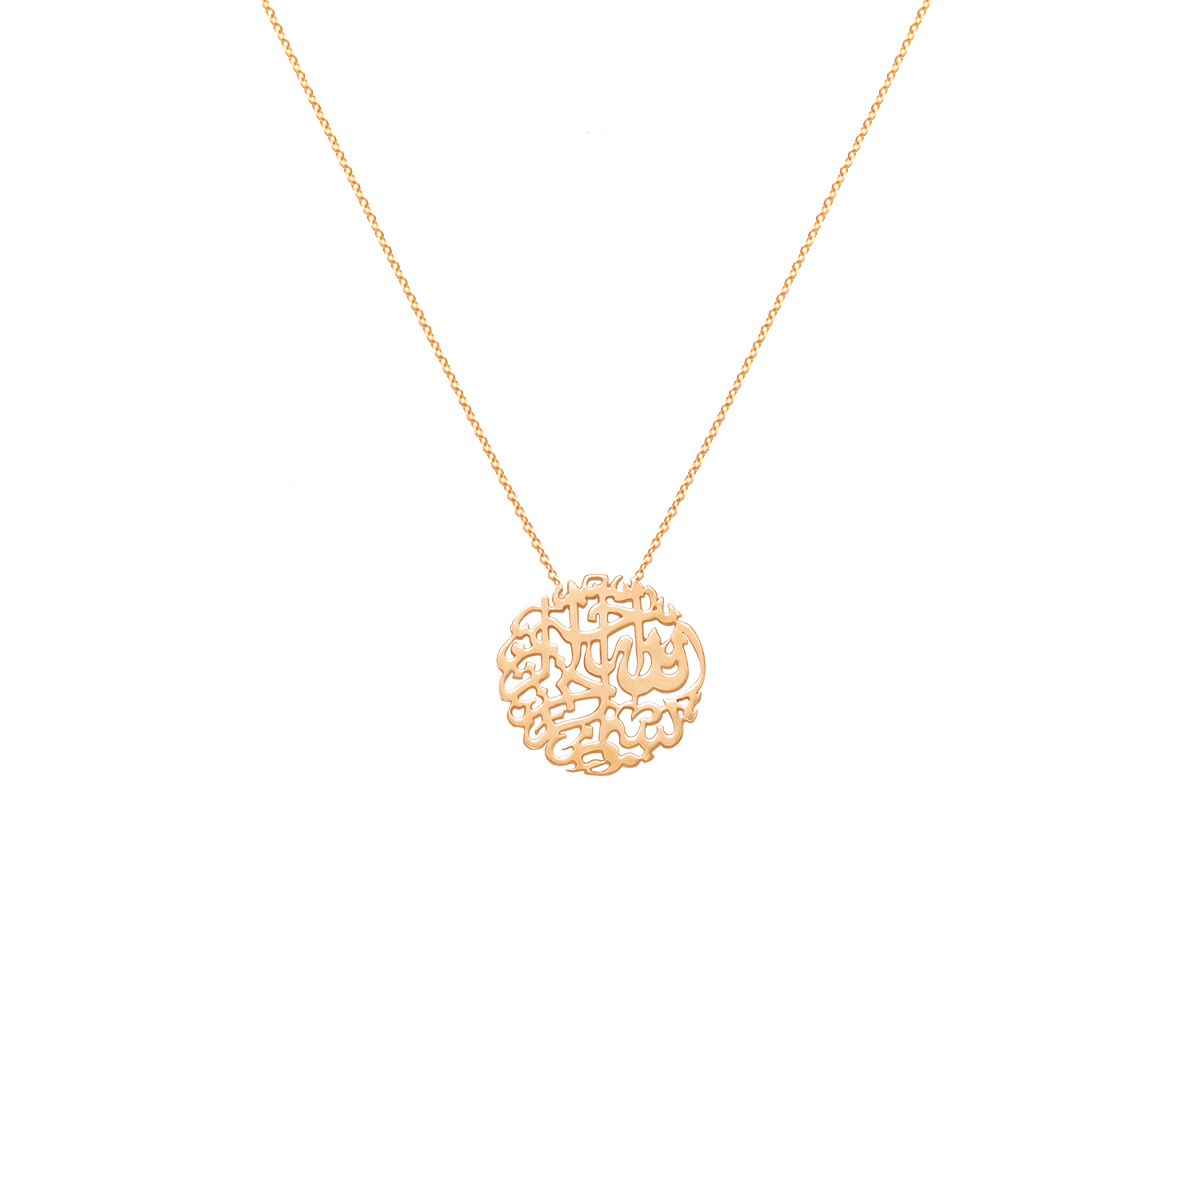 پرسته گردنبند طلا بسم الله کوچک